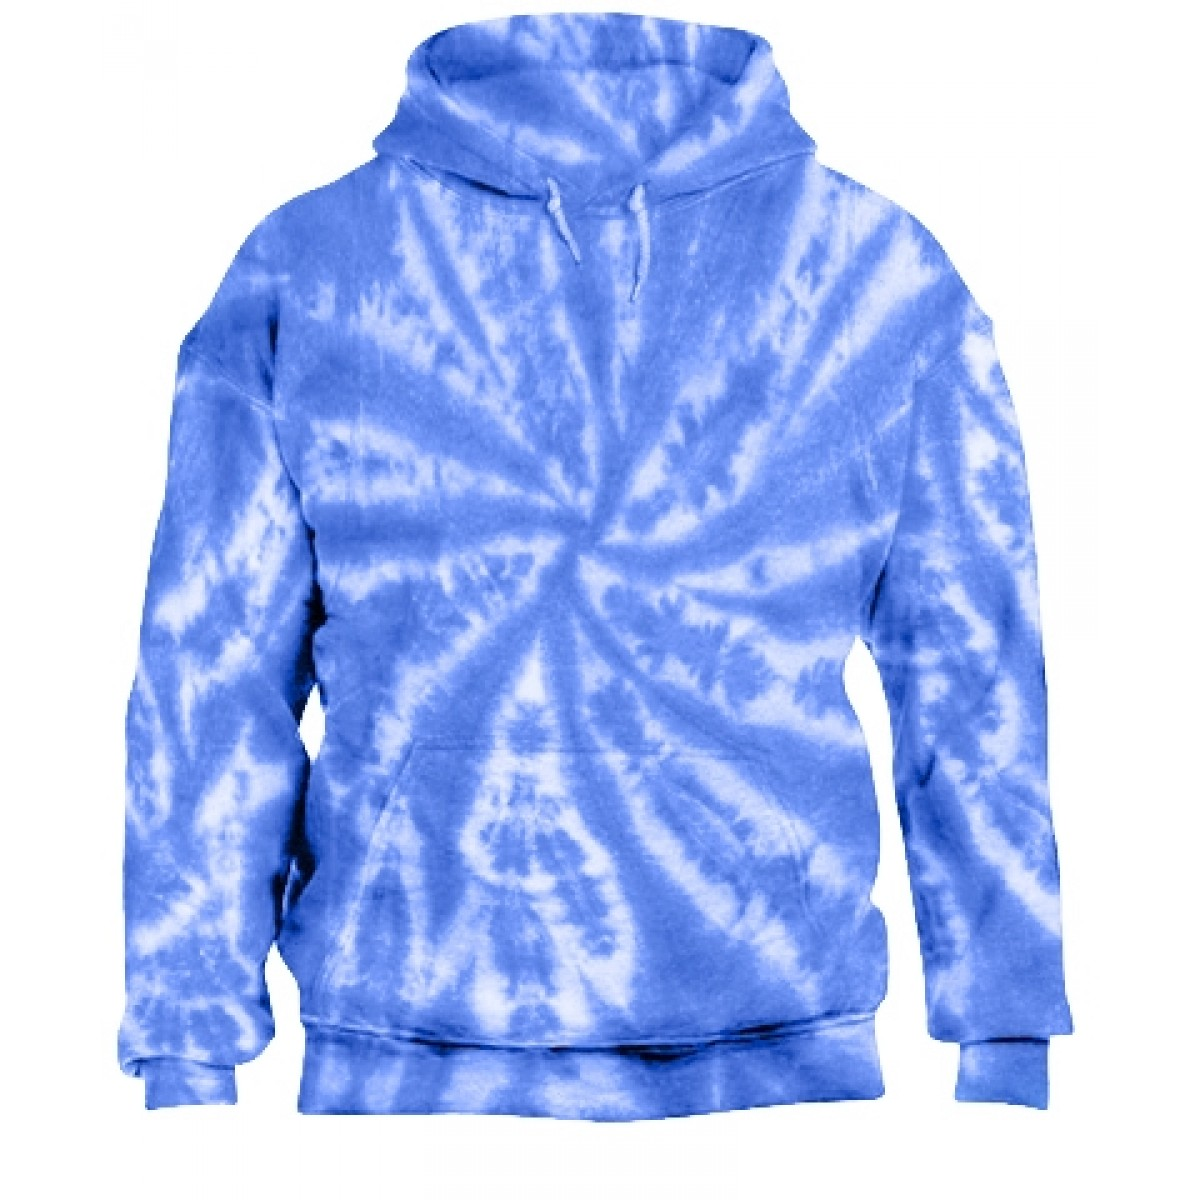 Tie-Dye Pullover Hooded Sweatshirt-Blue-S